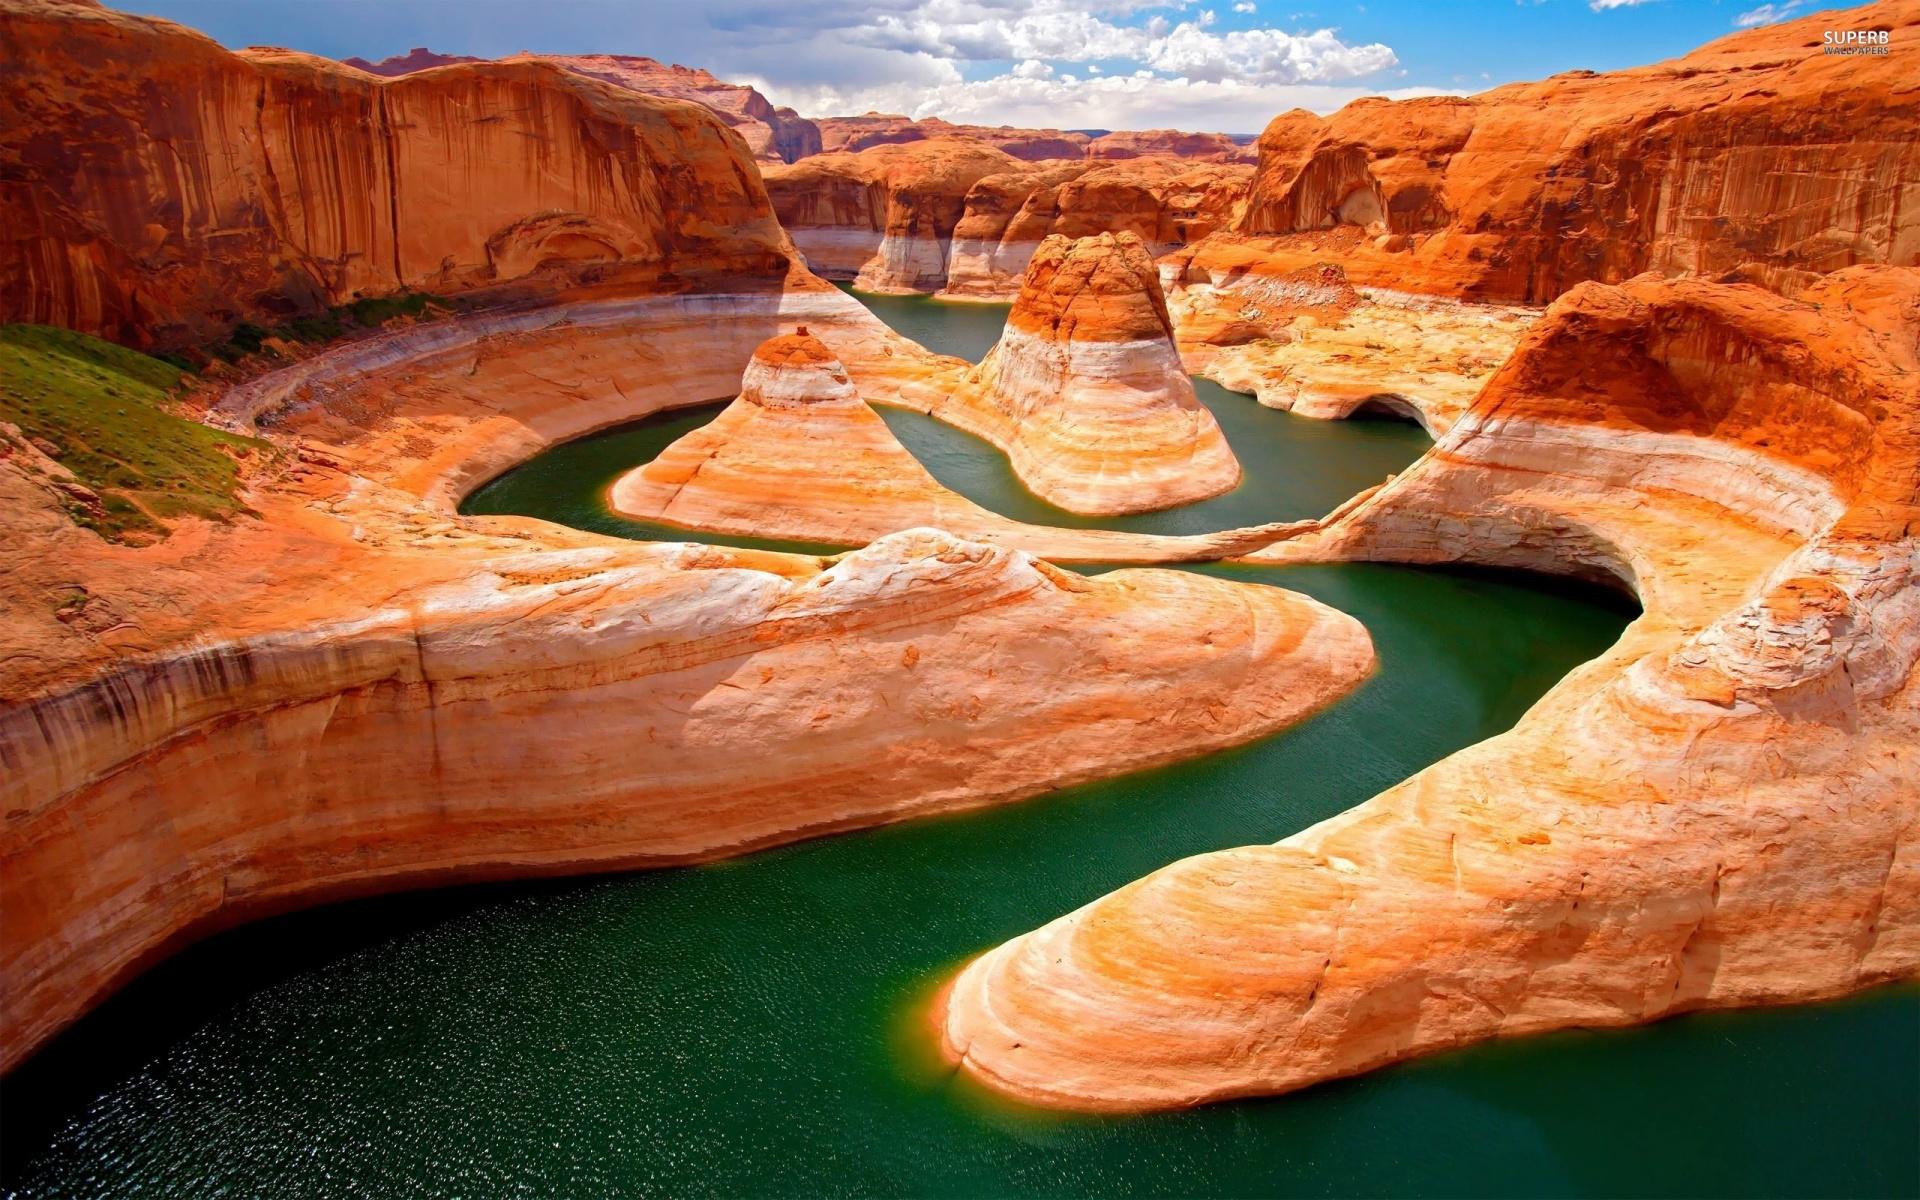 1920x1200 Grand Canyon Colorado River desktop PC and Mac wallpaper 1920x1200